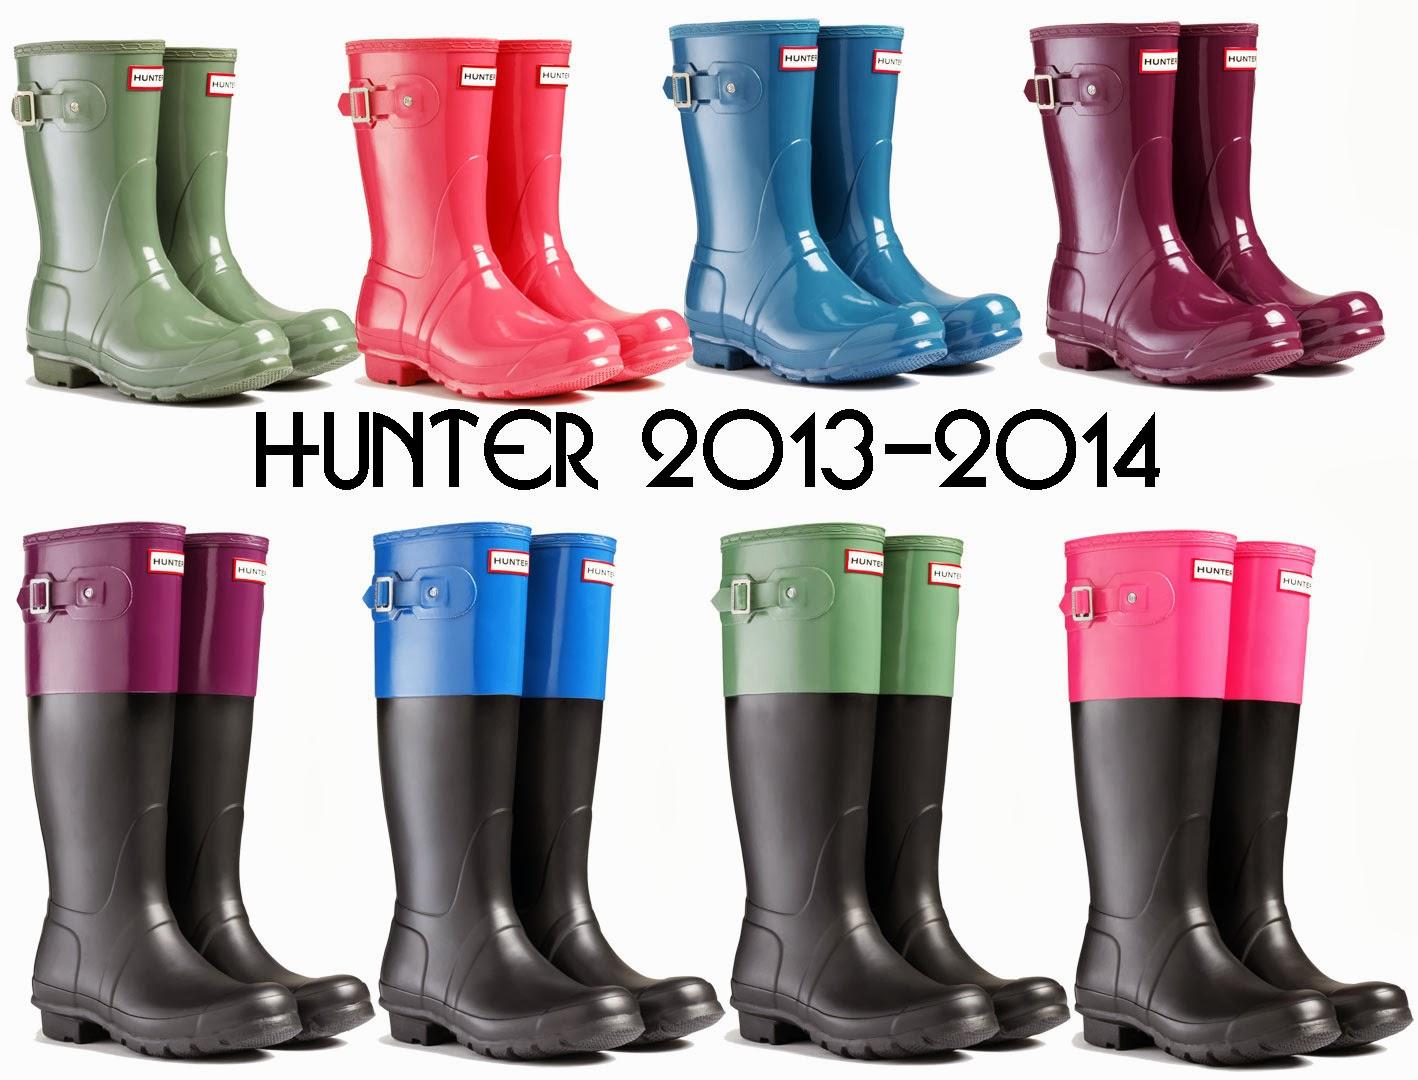 Hunter Outono/Inverno 2013